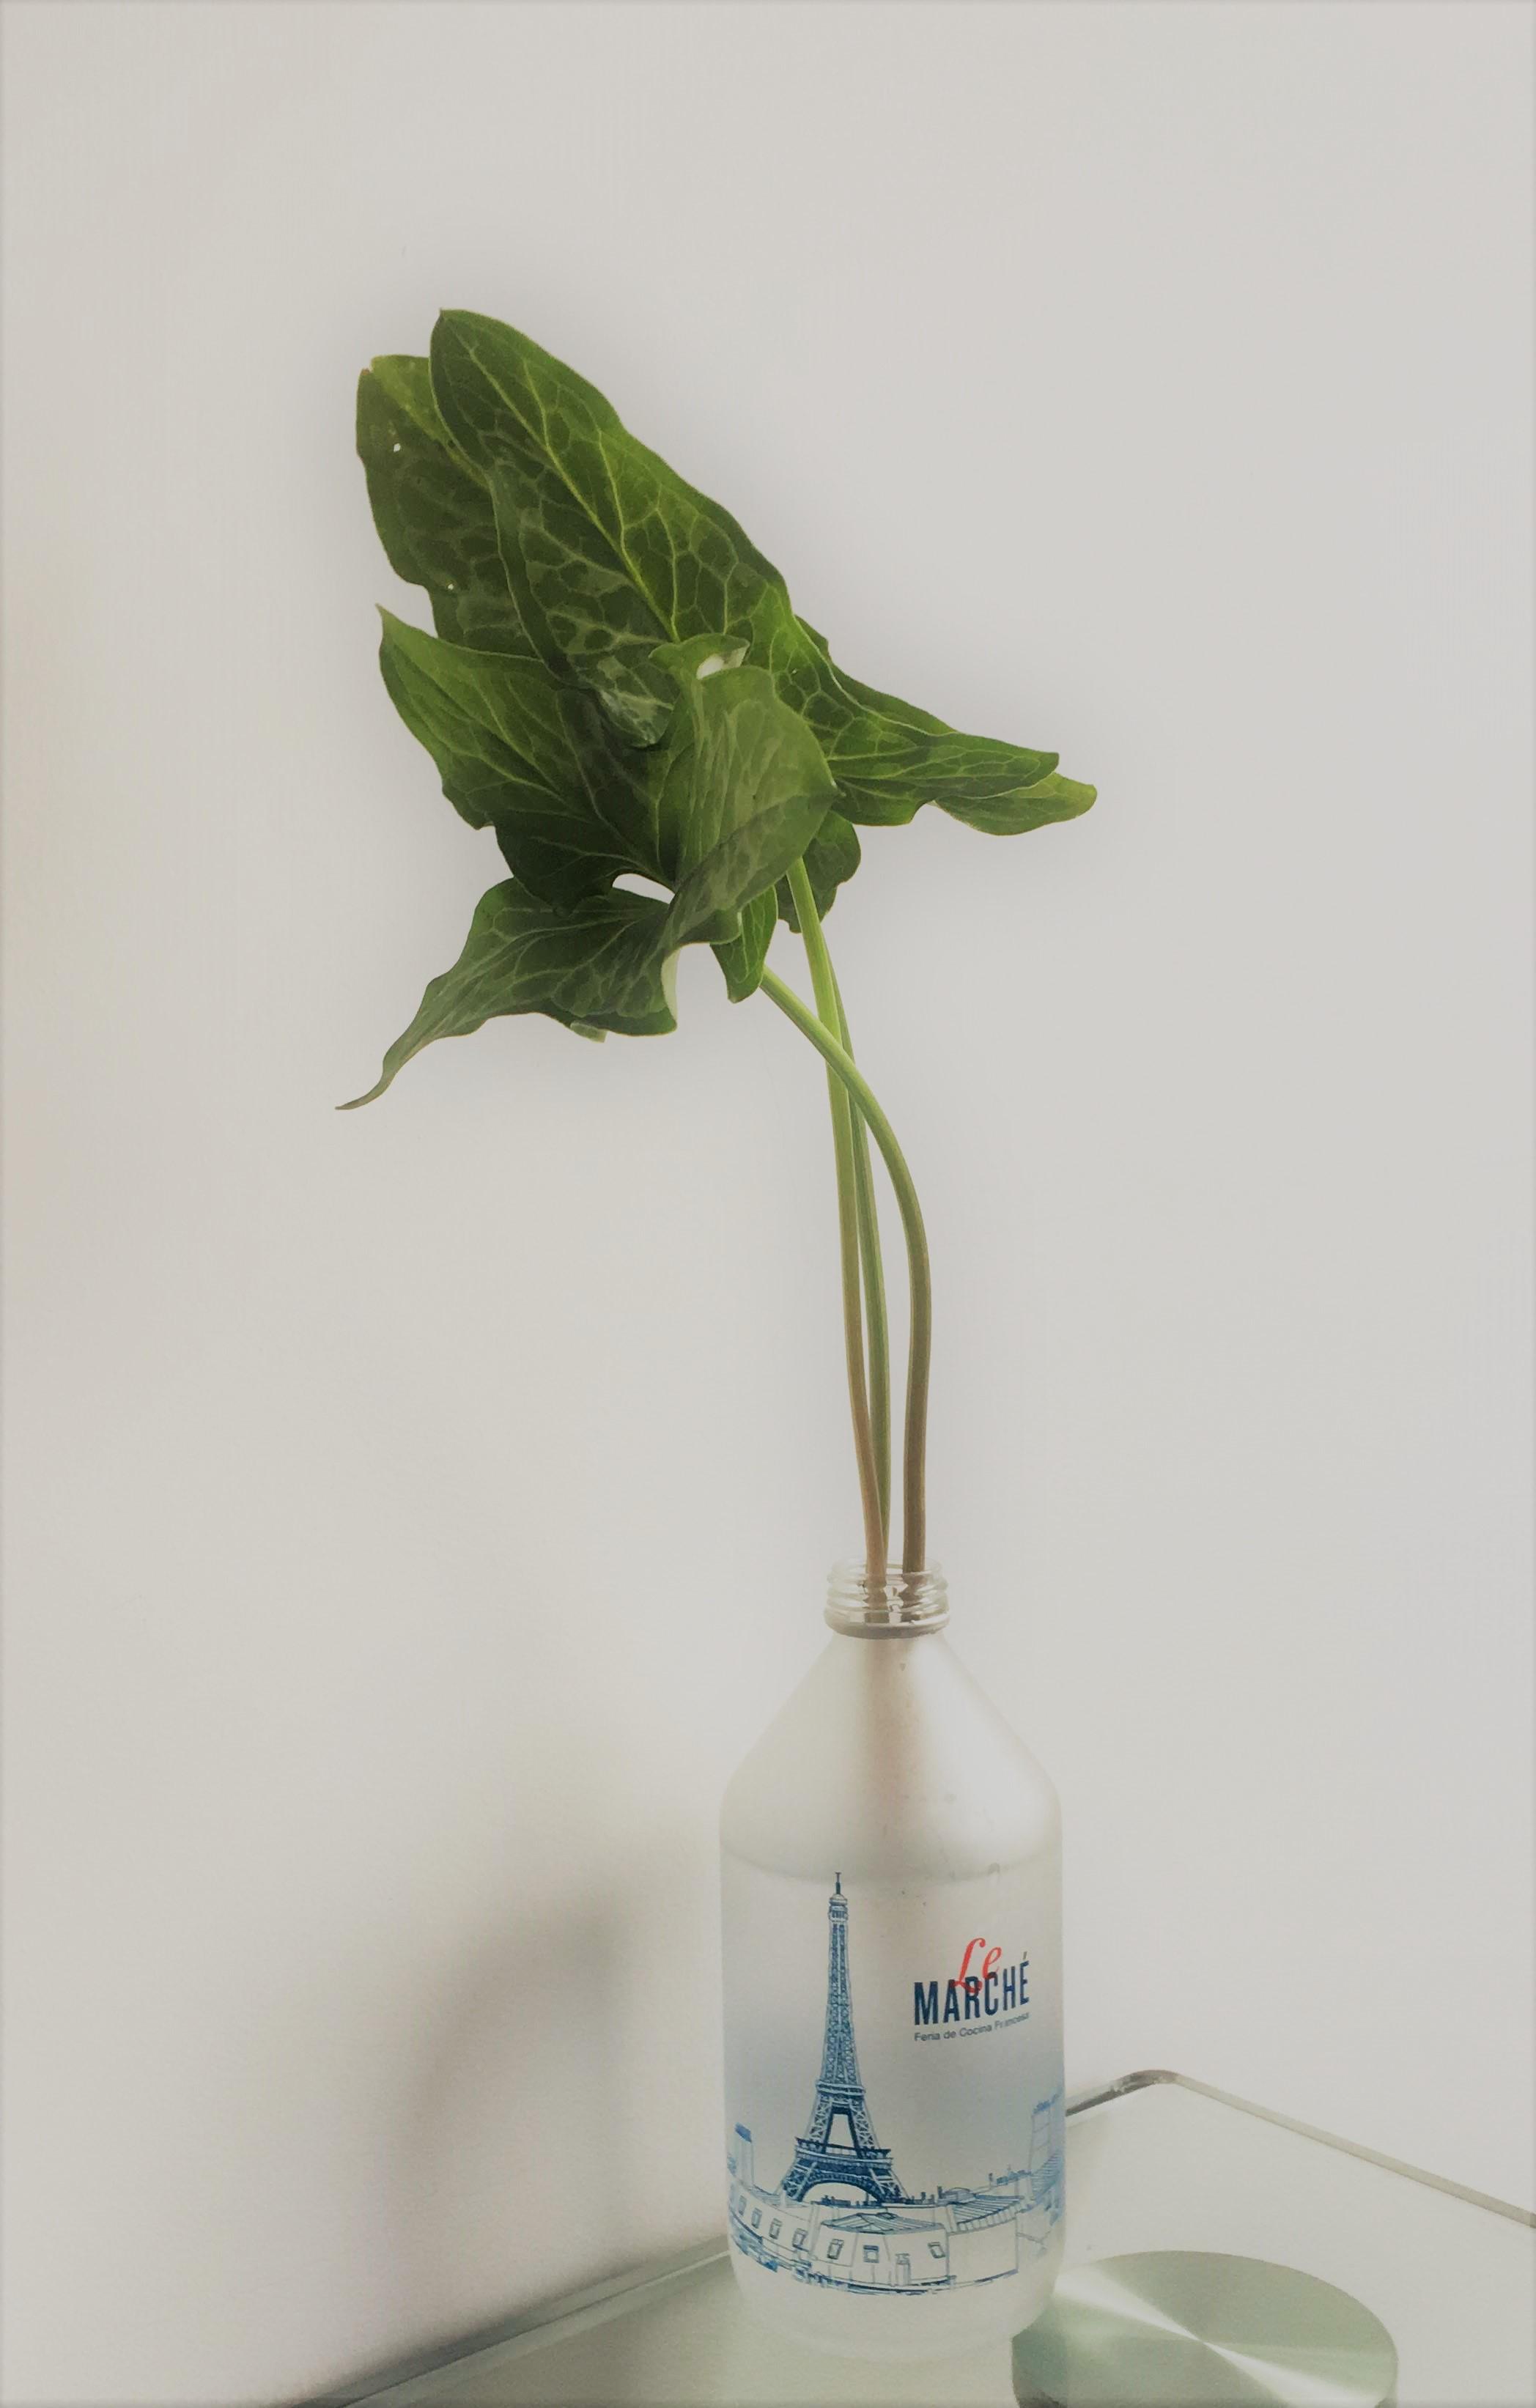 acuatica planta.jpg